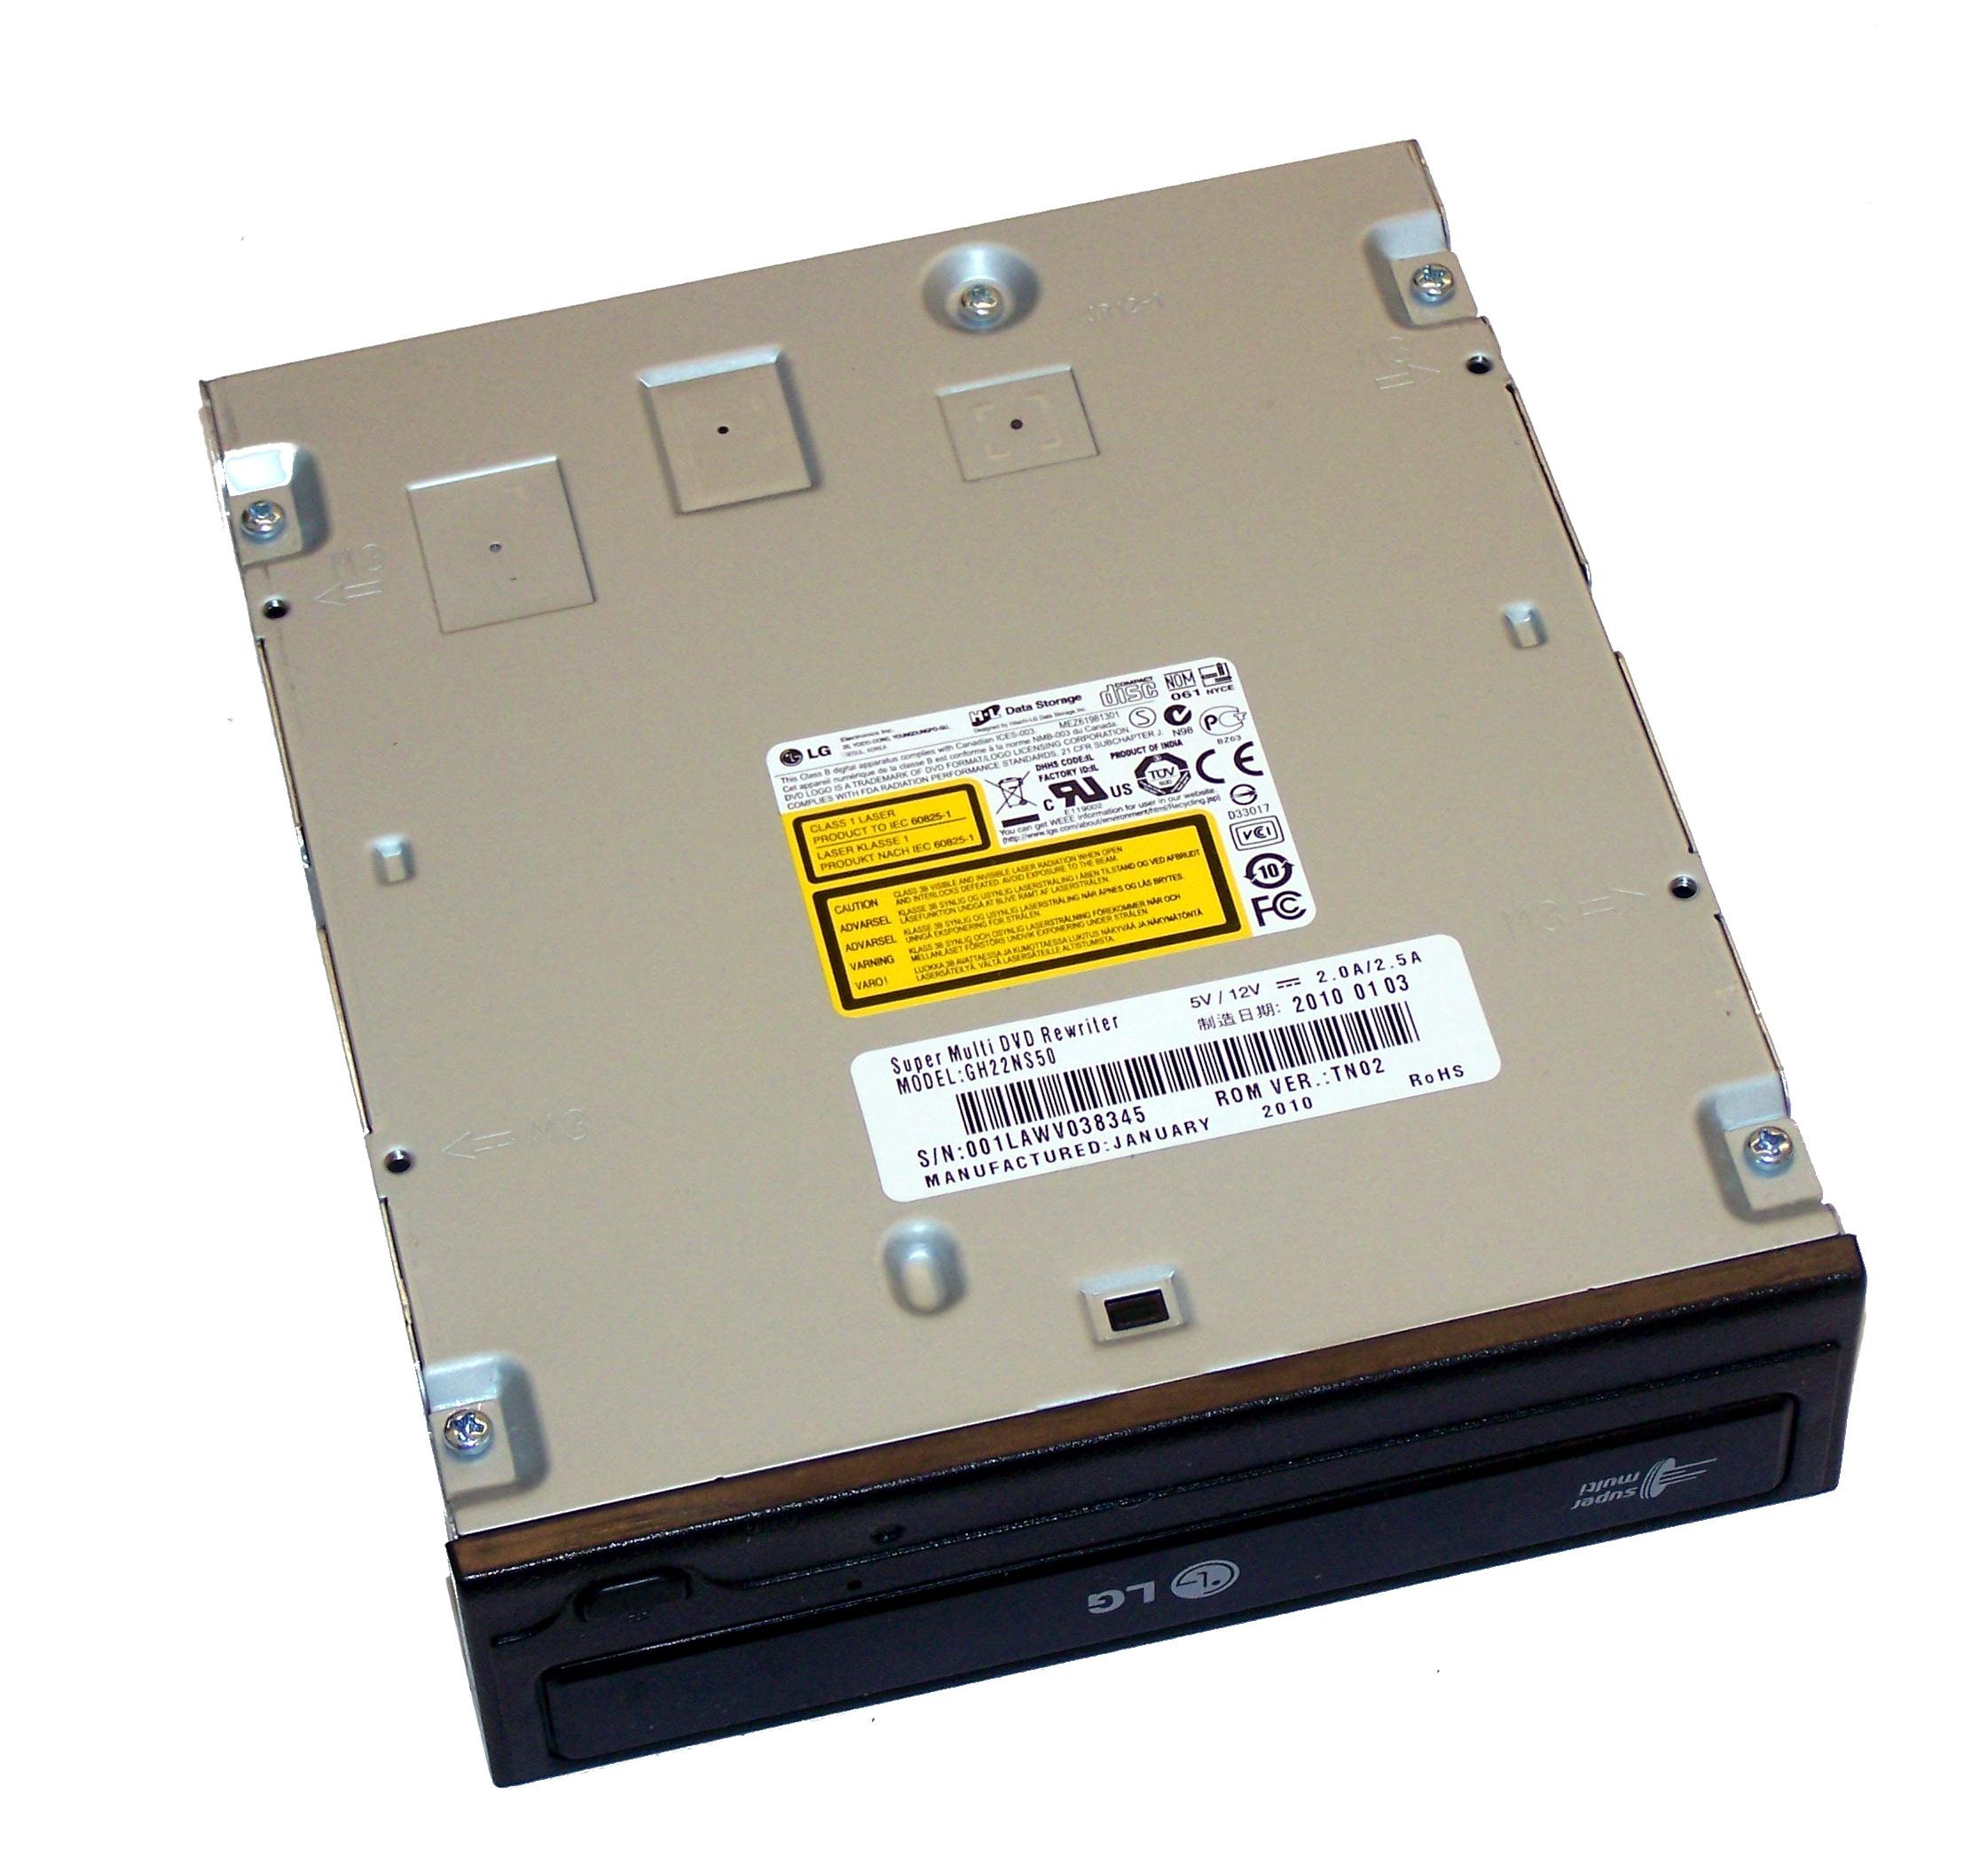 HL Data GH22NS50 SATA H/H DVD-RW Recorder | Black Bezel Thumbnail 1